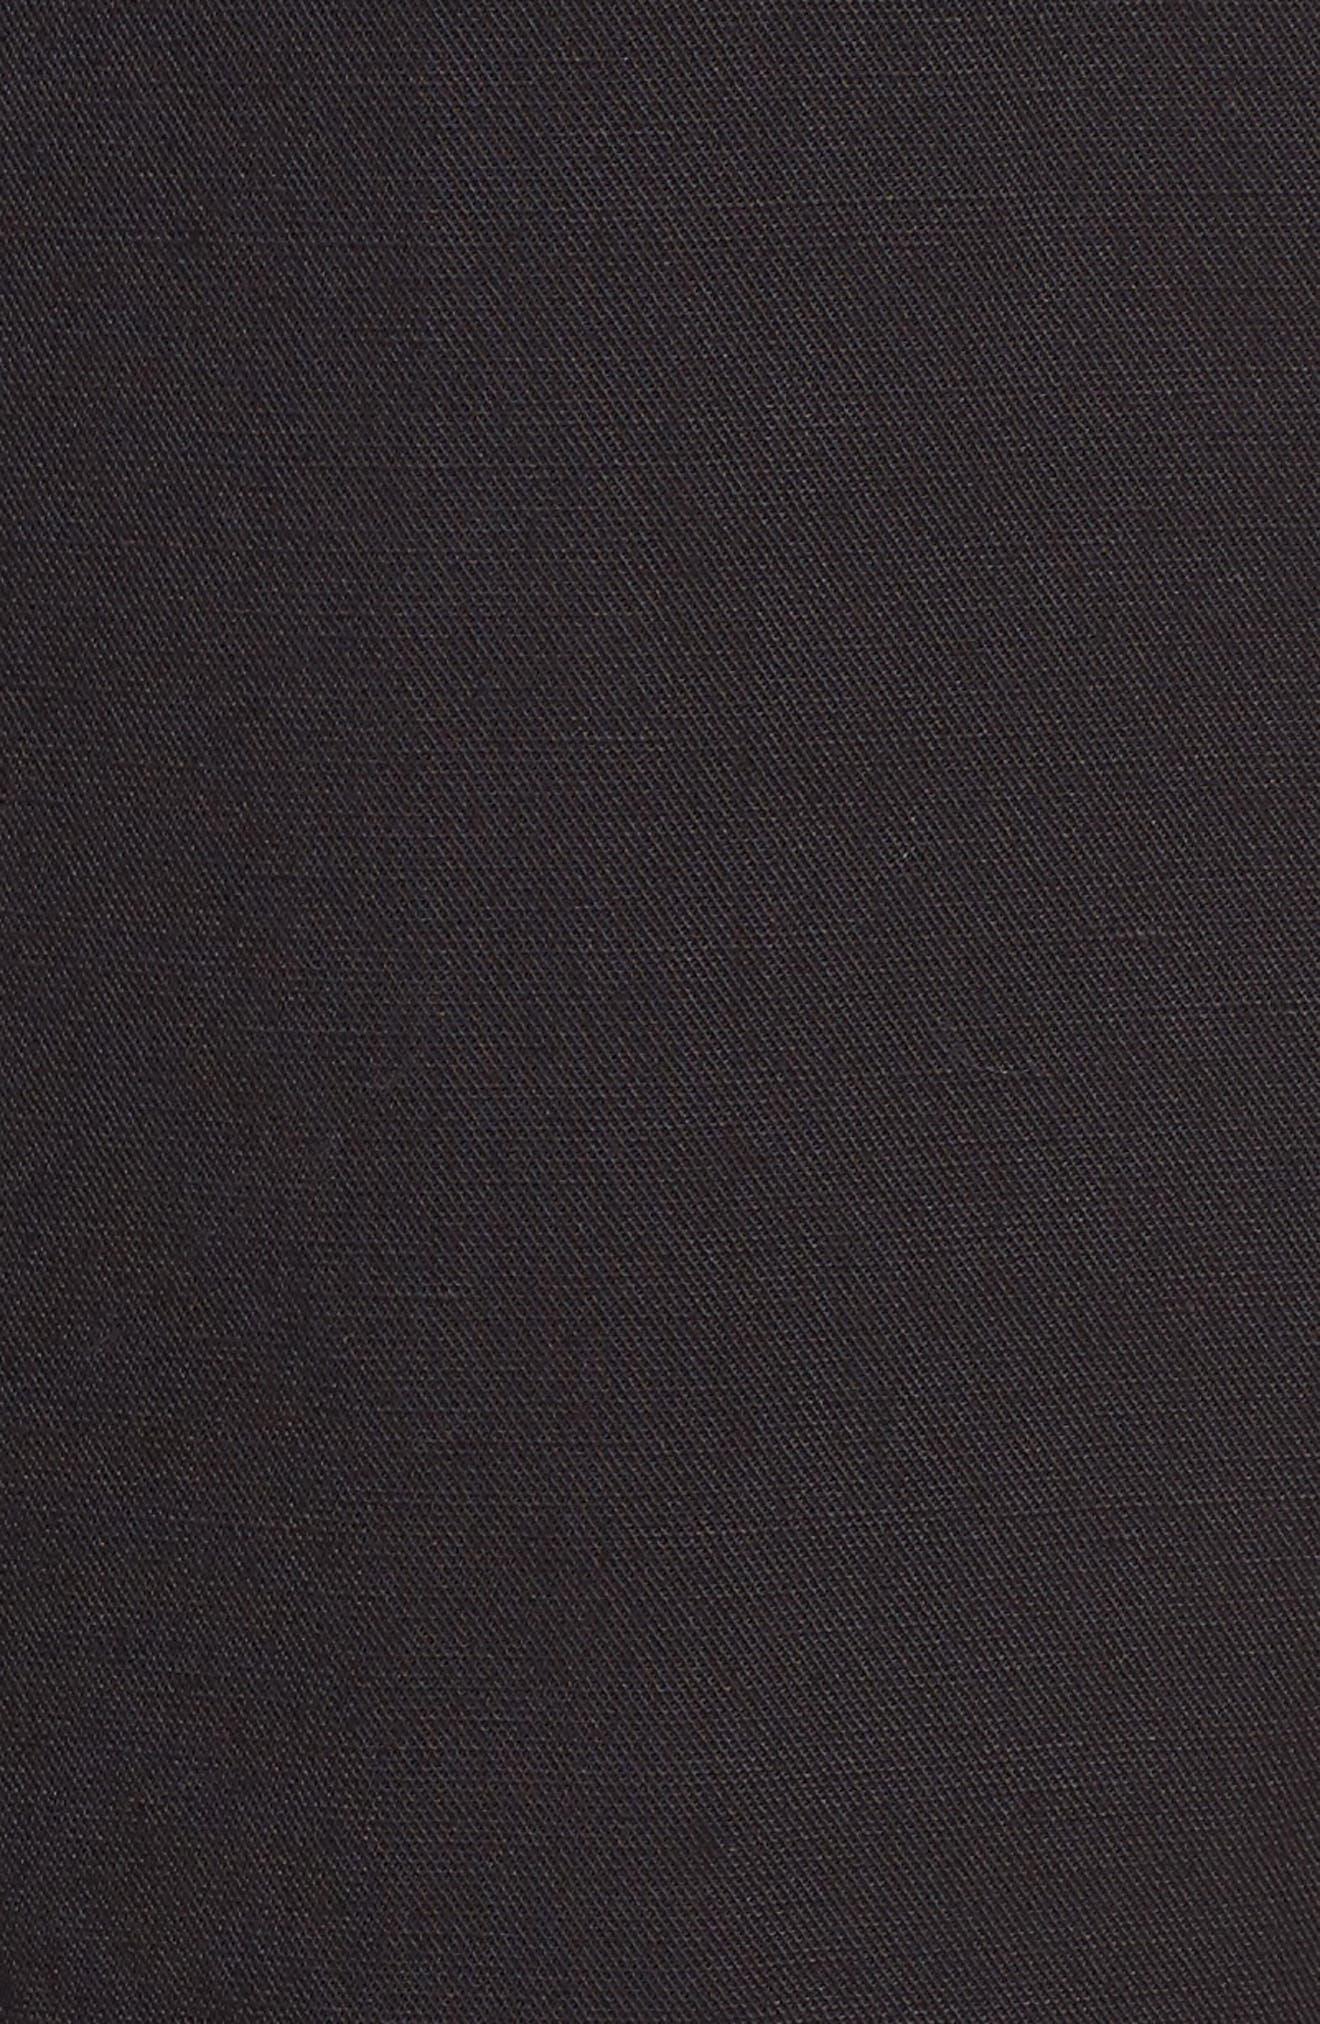 Tencel<sup>®</sup> Lyocell & Linen Walking Shorts,                             Alternate thumbnail 5, color,                             Black